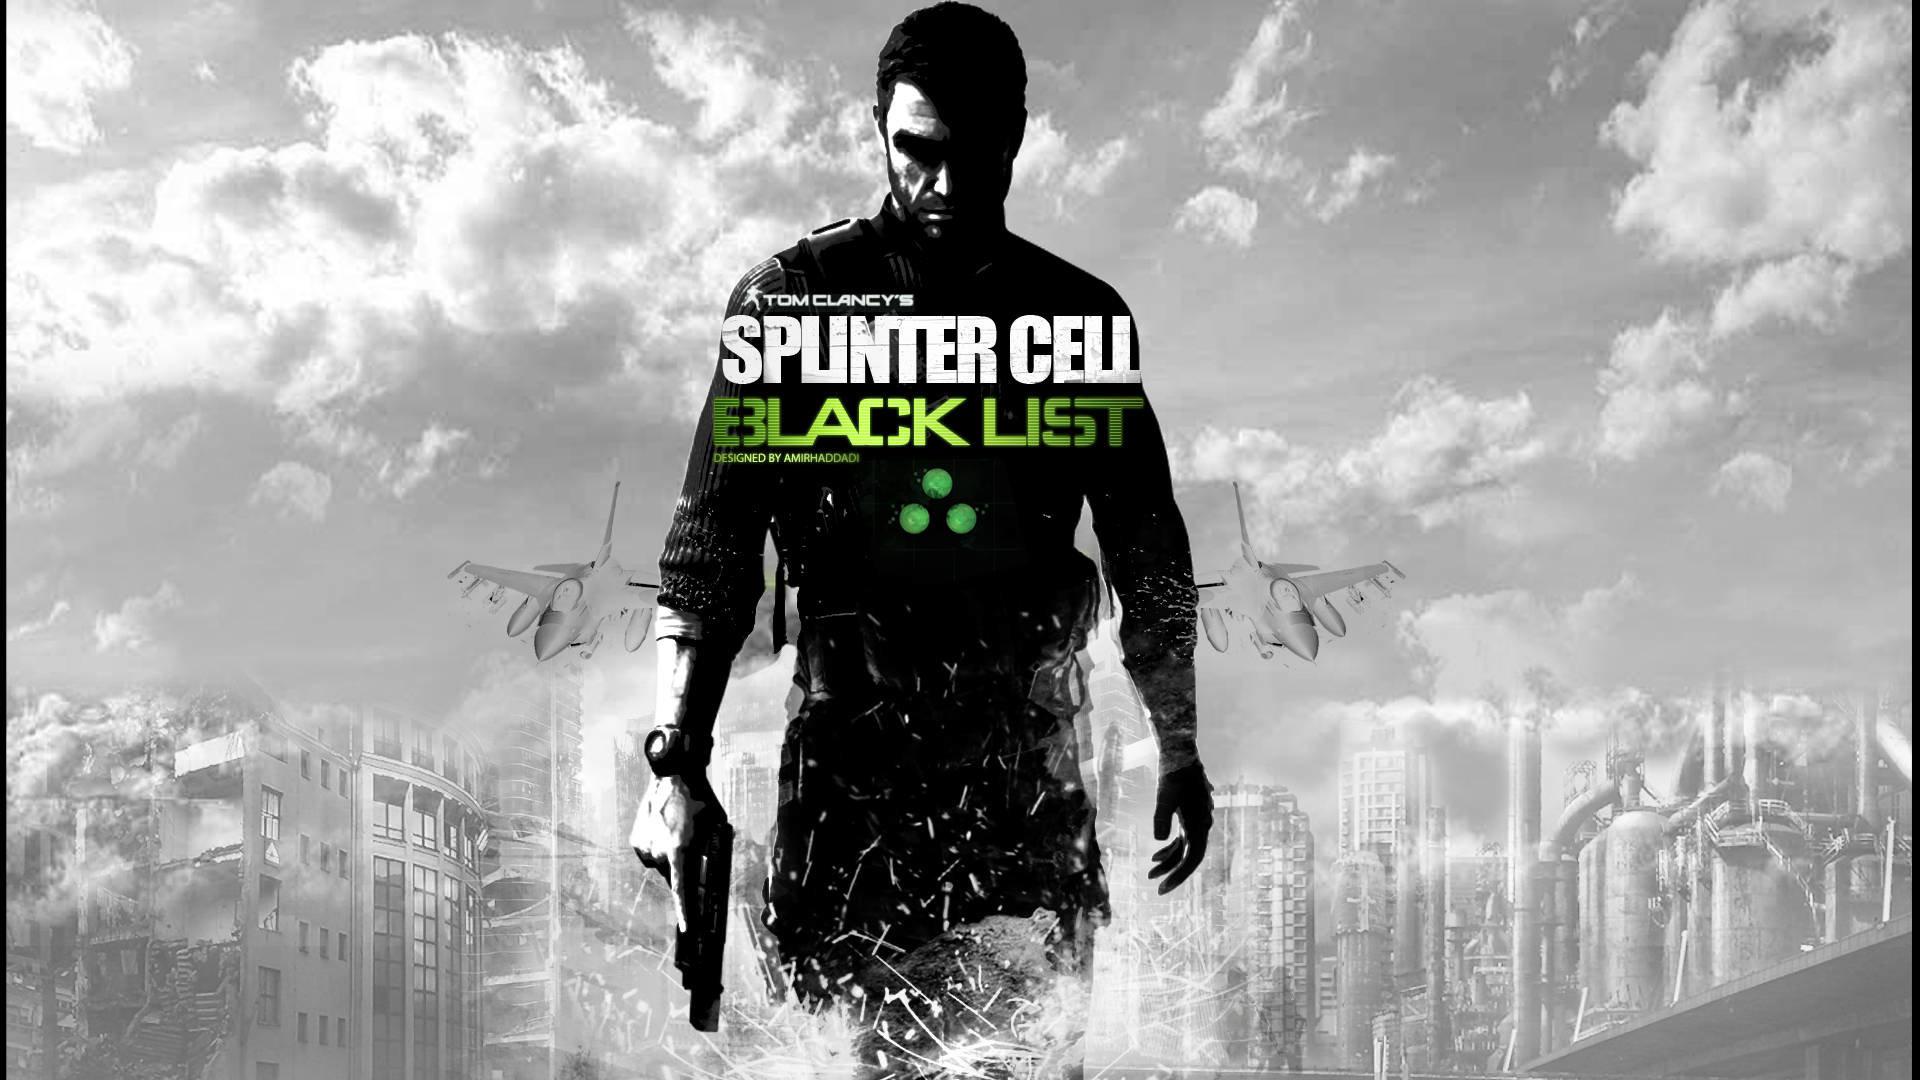 Tom Clancy S Splinter Cell Blacklist Wallpapers Hd For Desktop